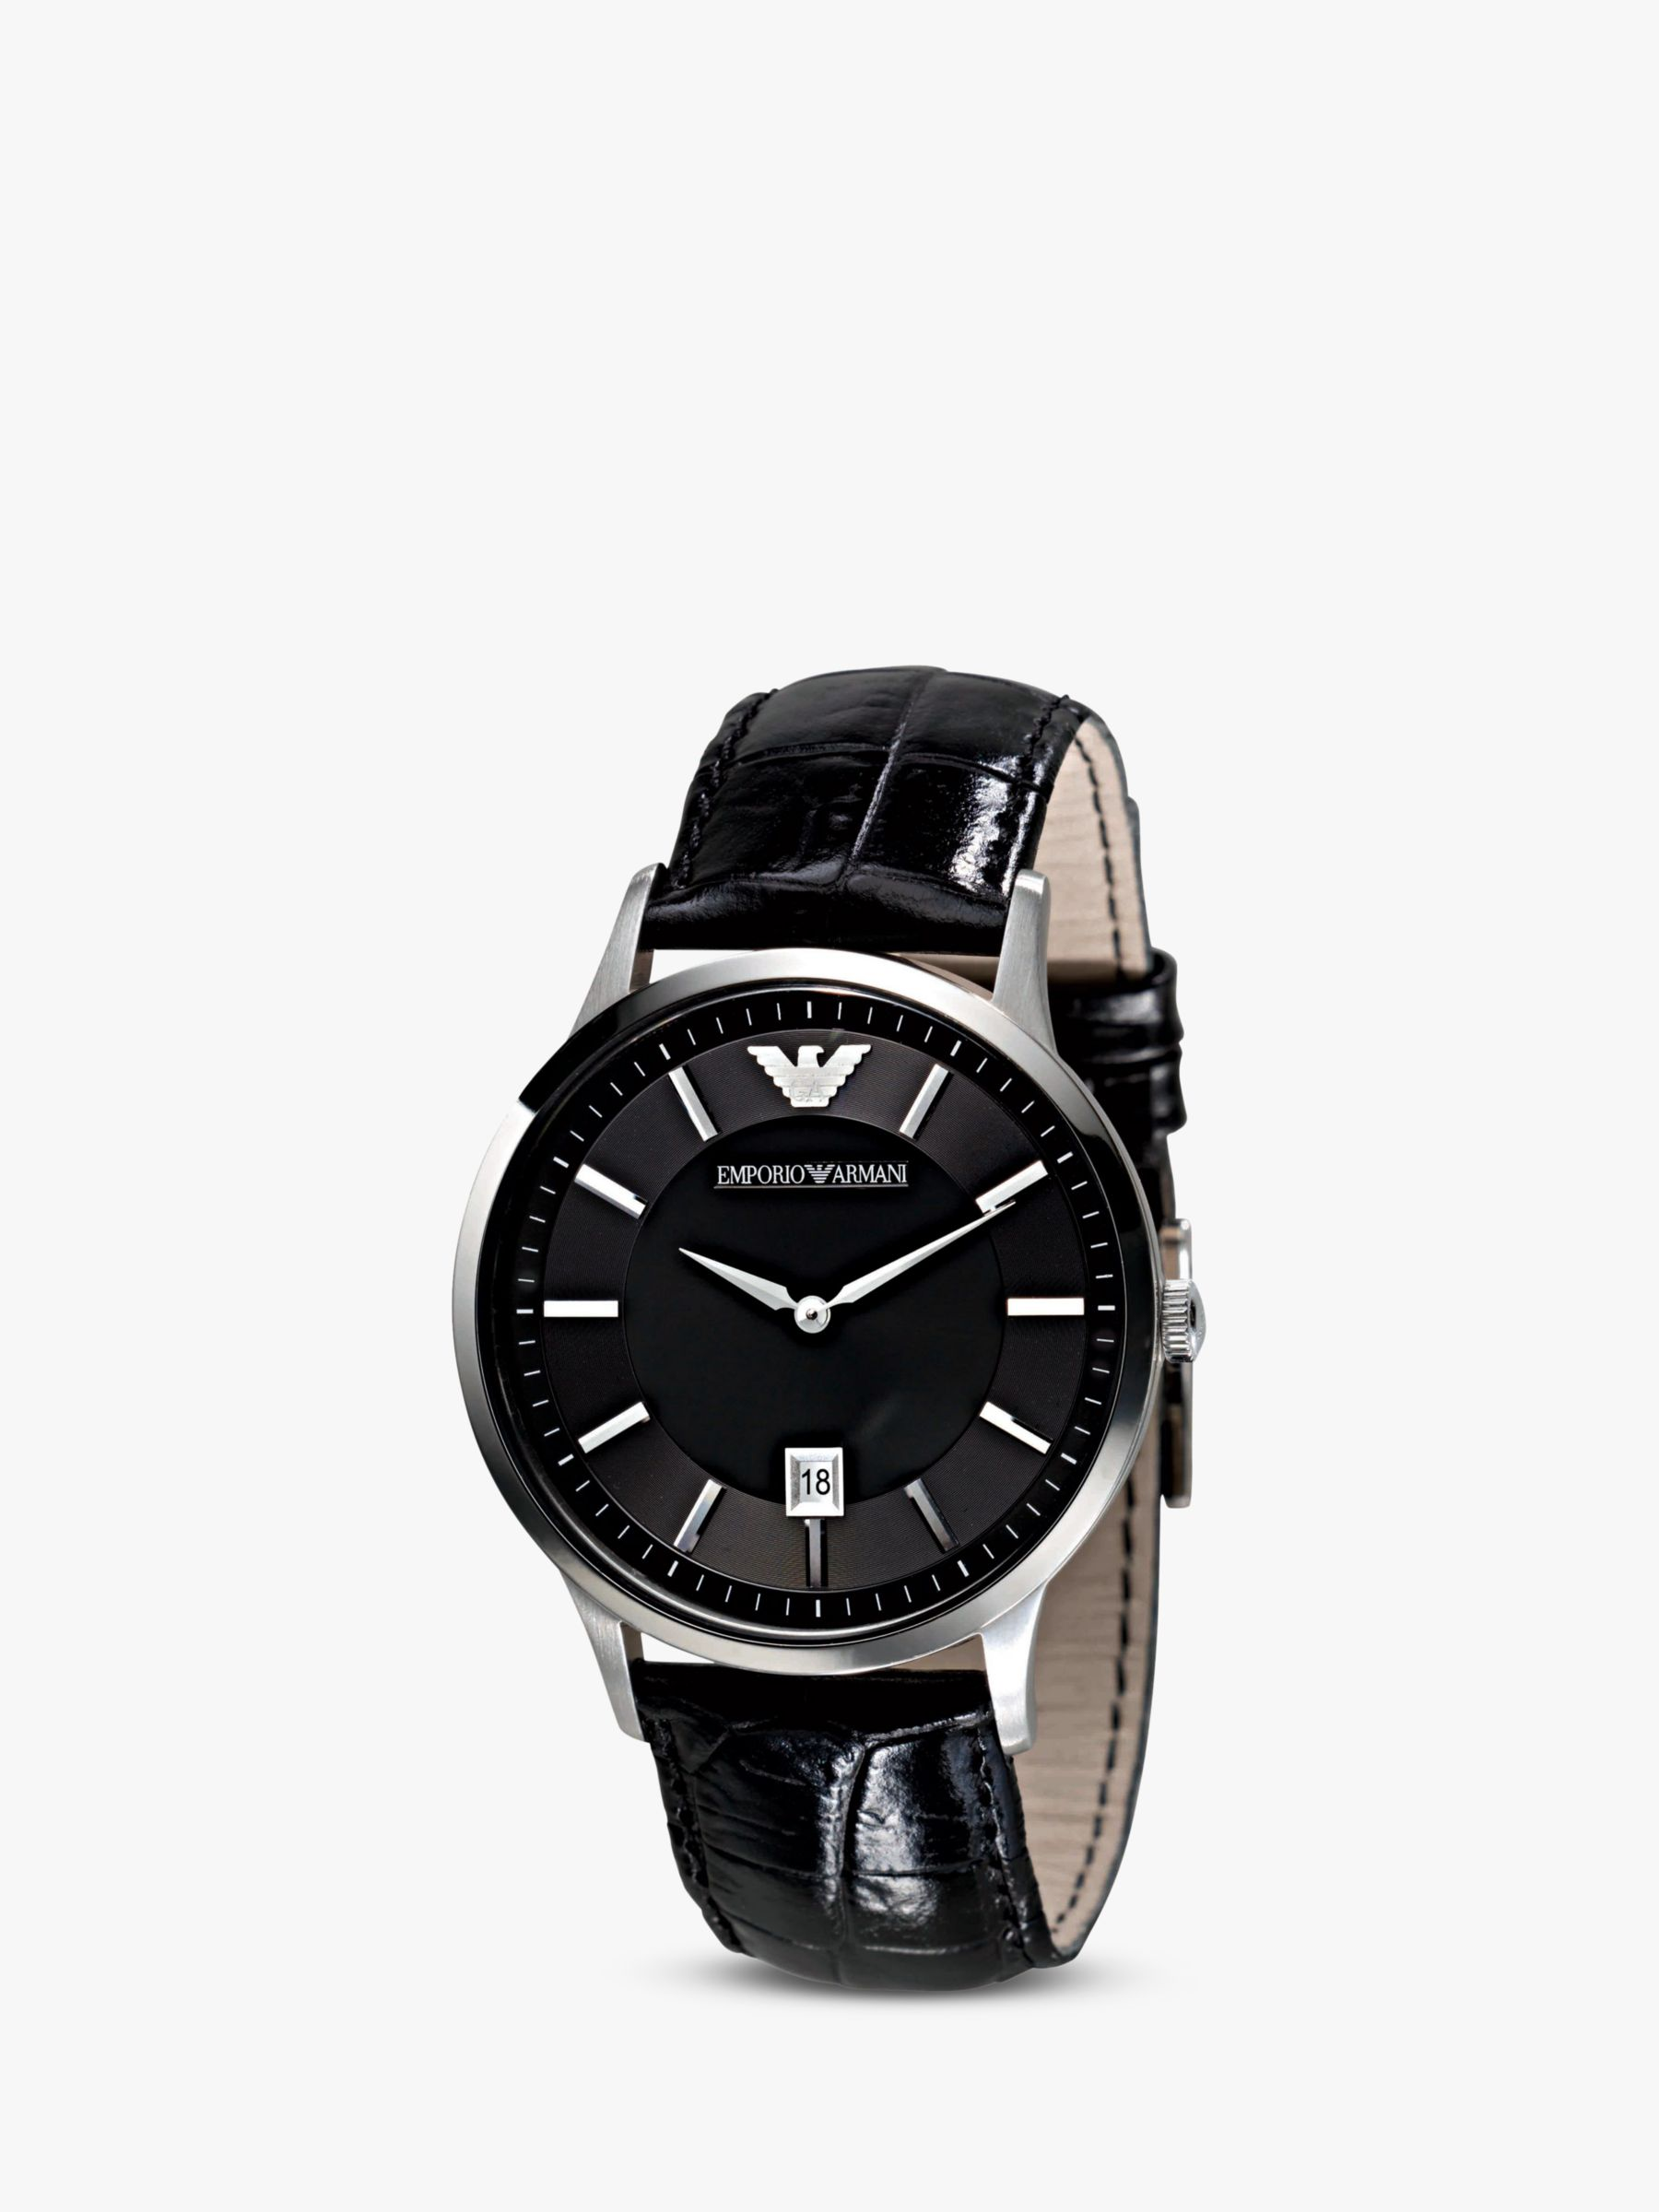 Emporio Armani AR2411 Men's Leather Strap Watch, Black/Silver